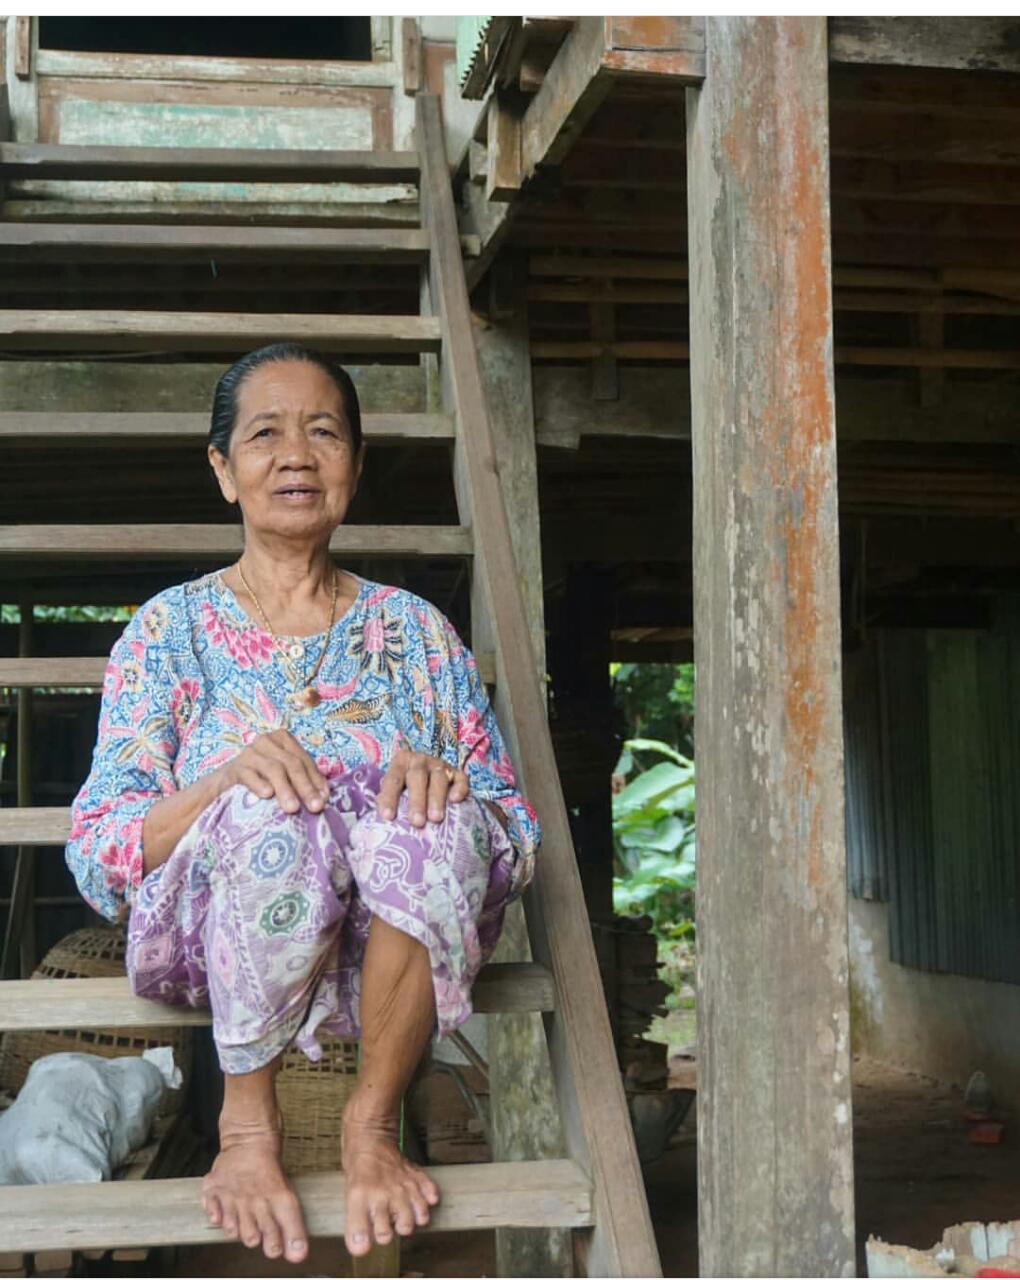 Tradisi Mabboka: Treatment Rambut Masyarakat Bugis Kuno